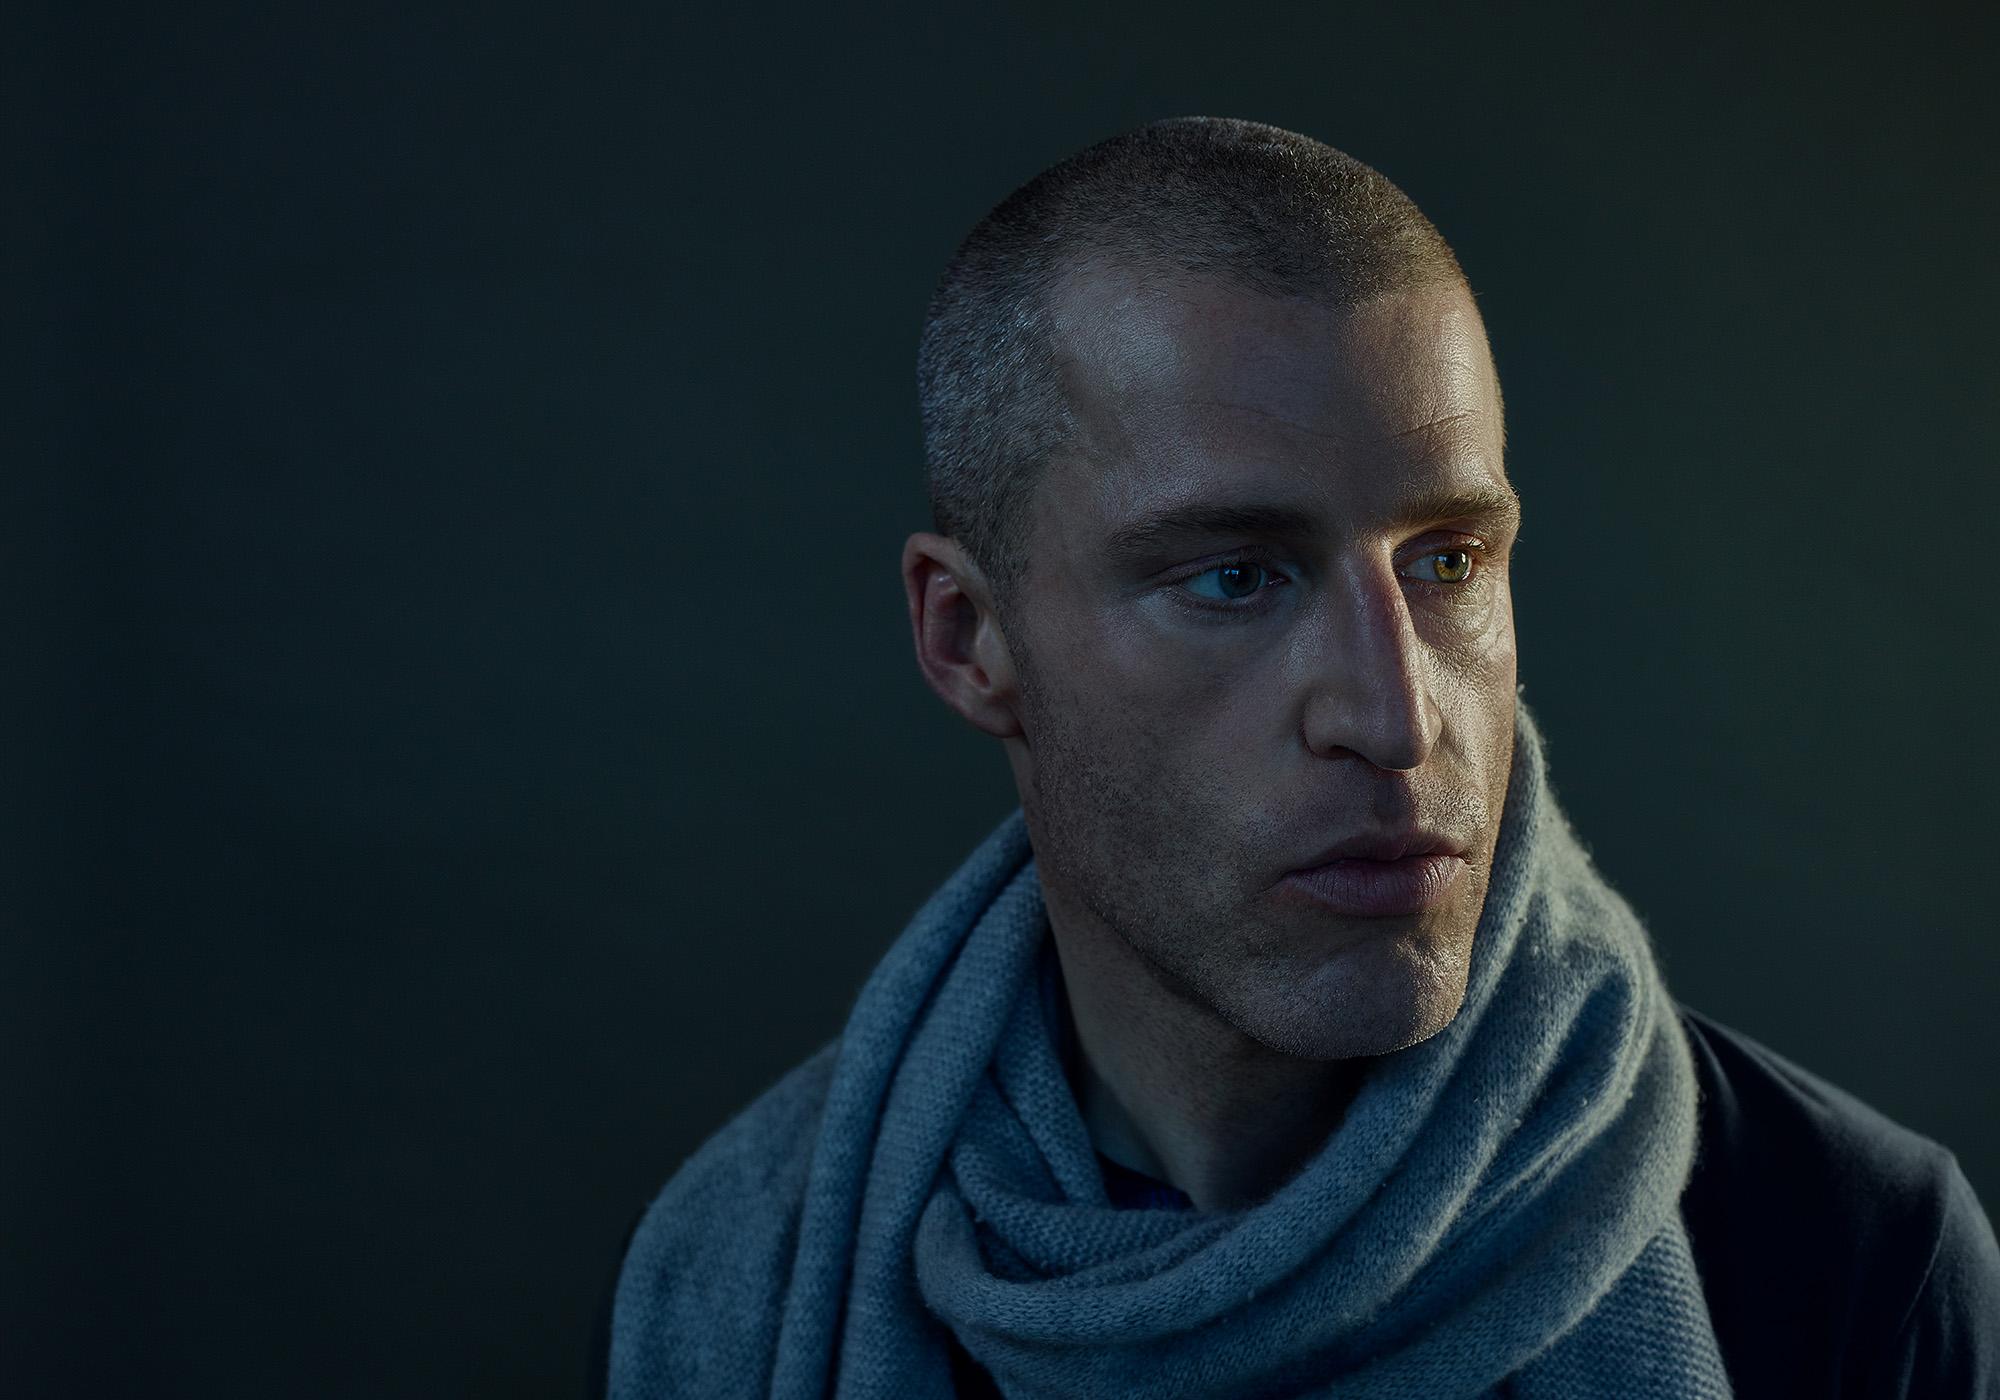 Benjamin von Stuckrad-Barre | Photographer Olaf Heine